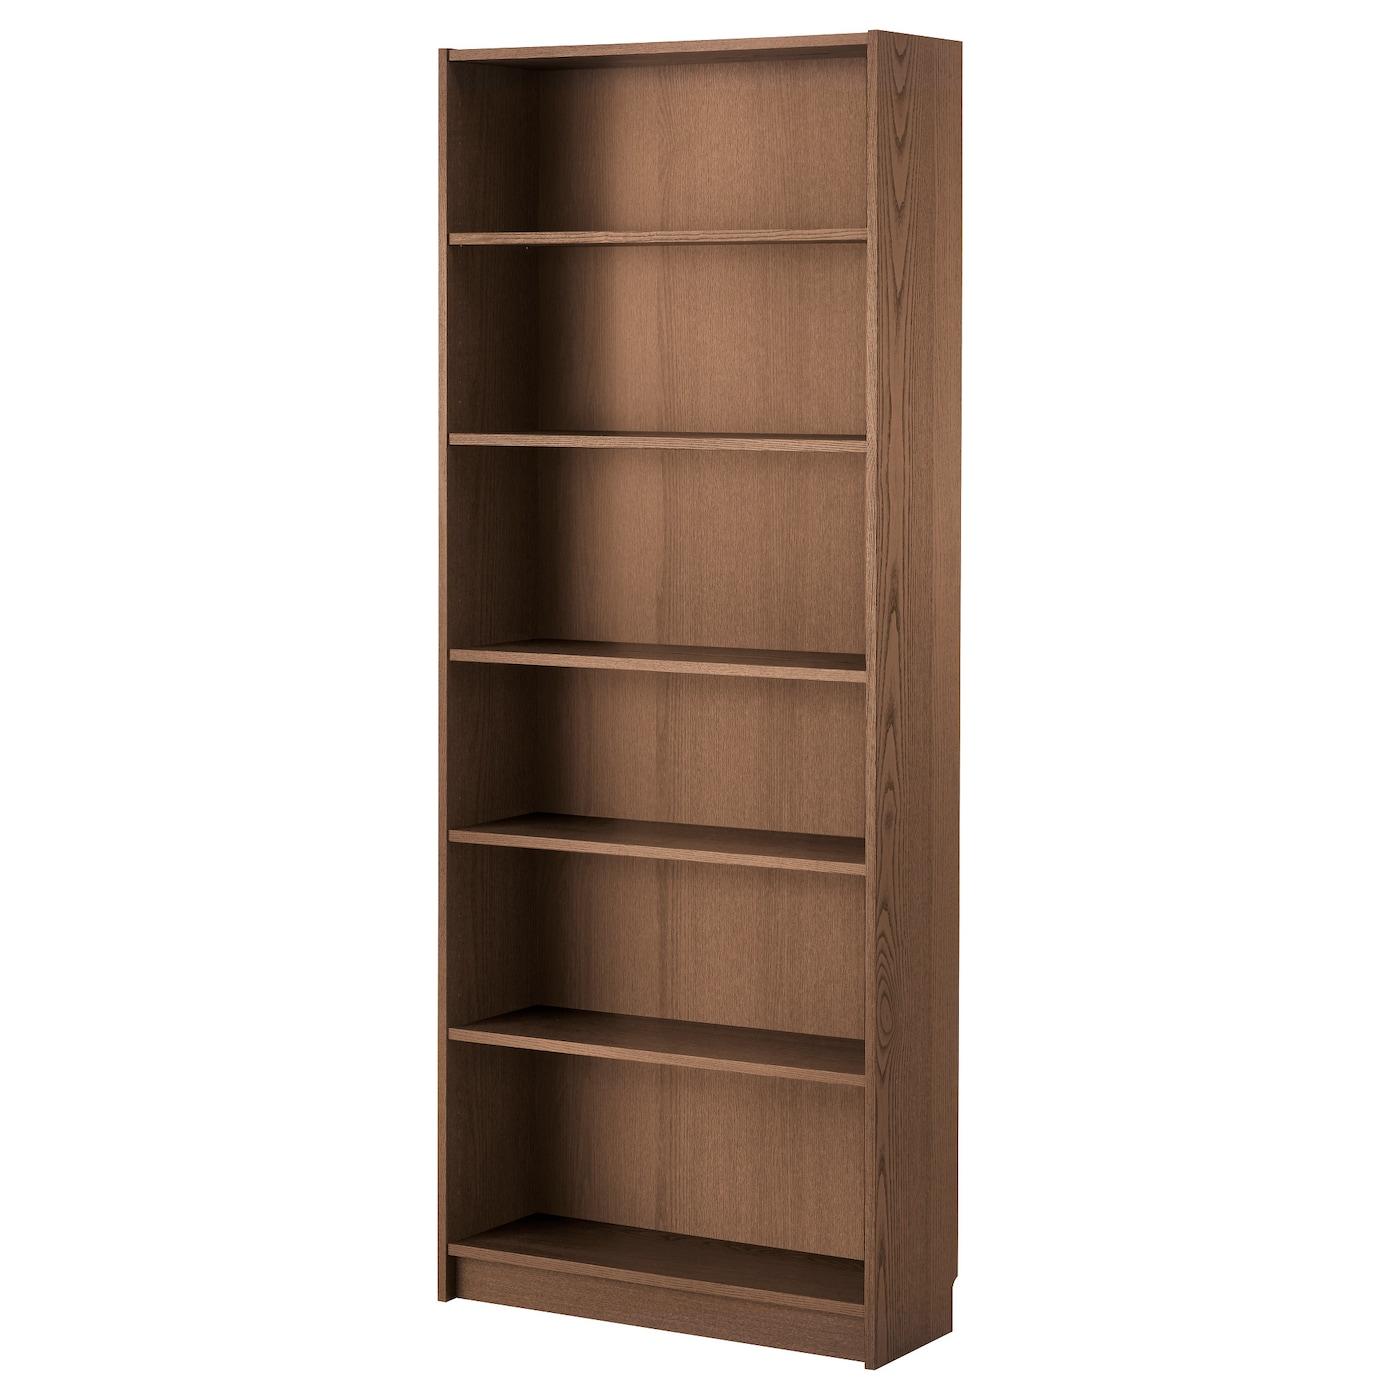 Ikea Billy Regal Bücherregal 80 x 28 x 202 cm braun in